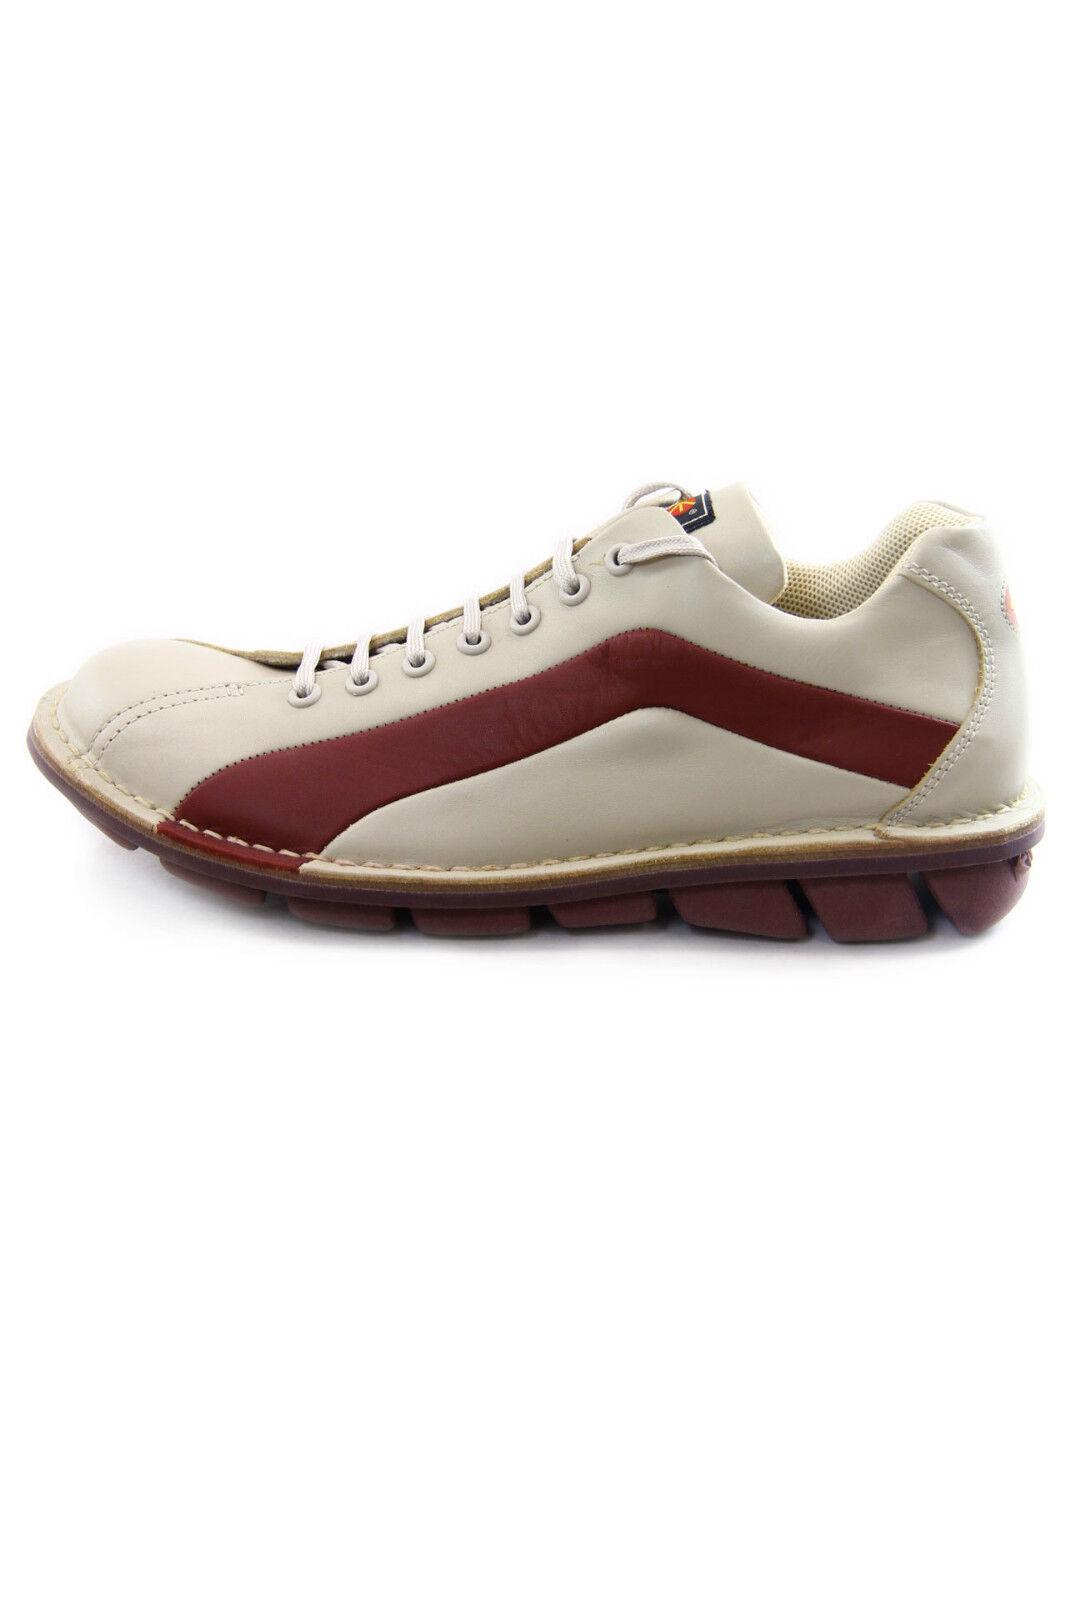 quality design 942fc 30d43 Energie Vintage scarpe da ginnastica in Leather mod. Justin ...